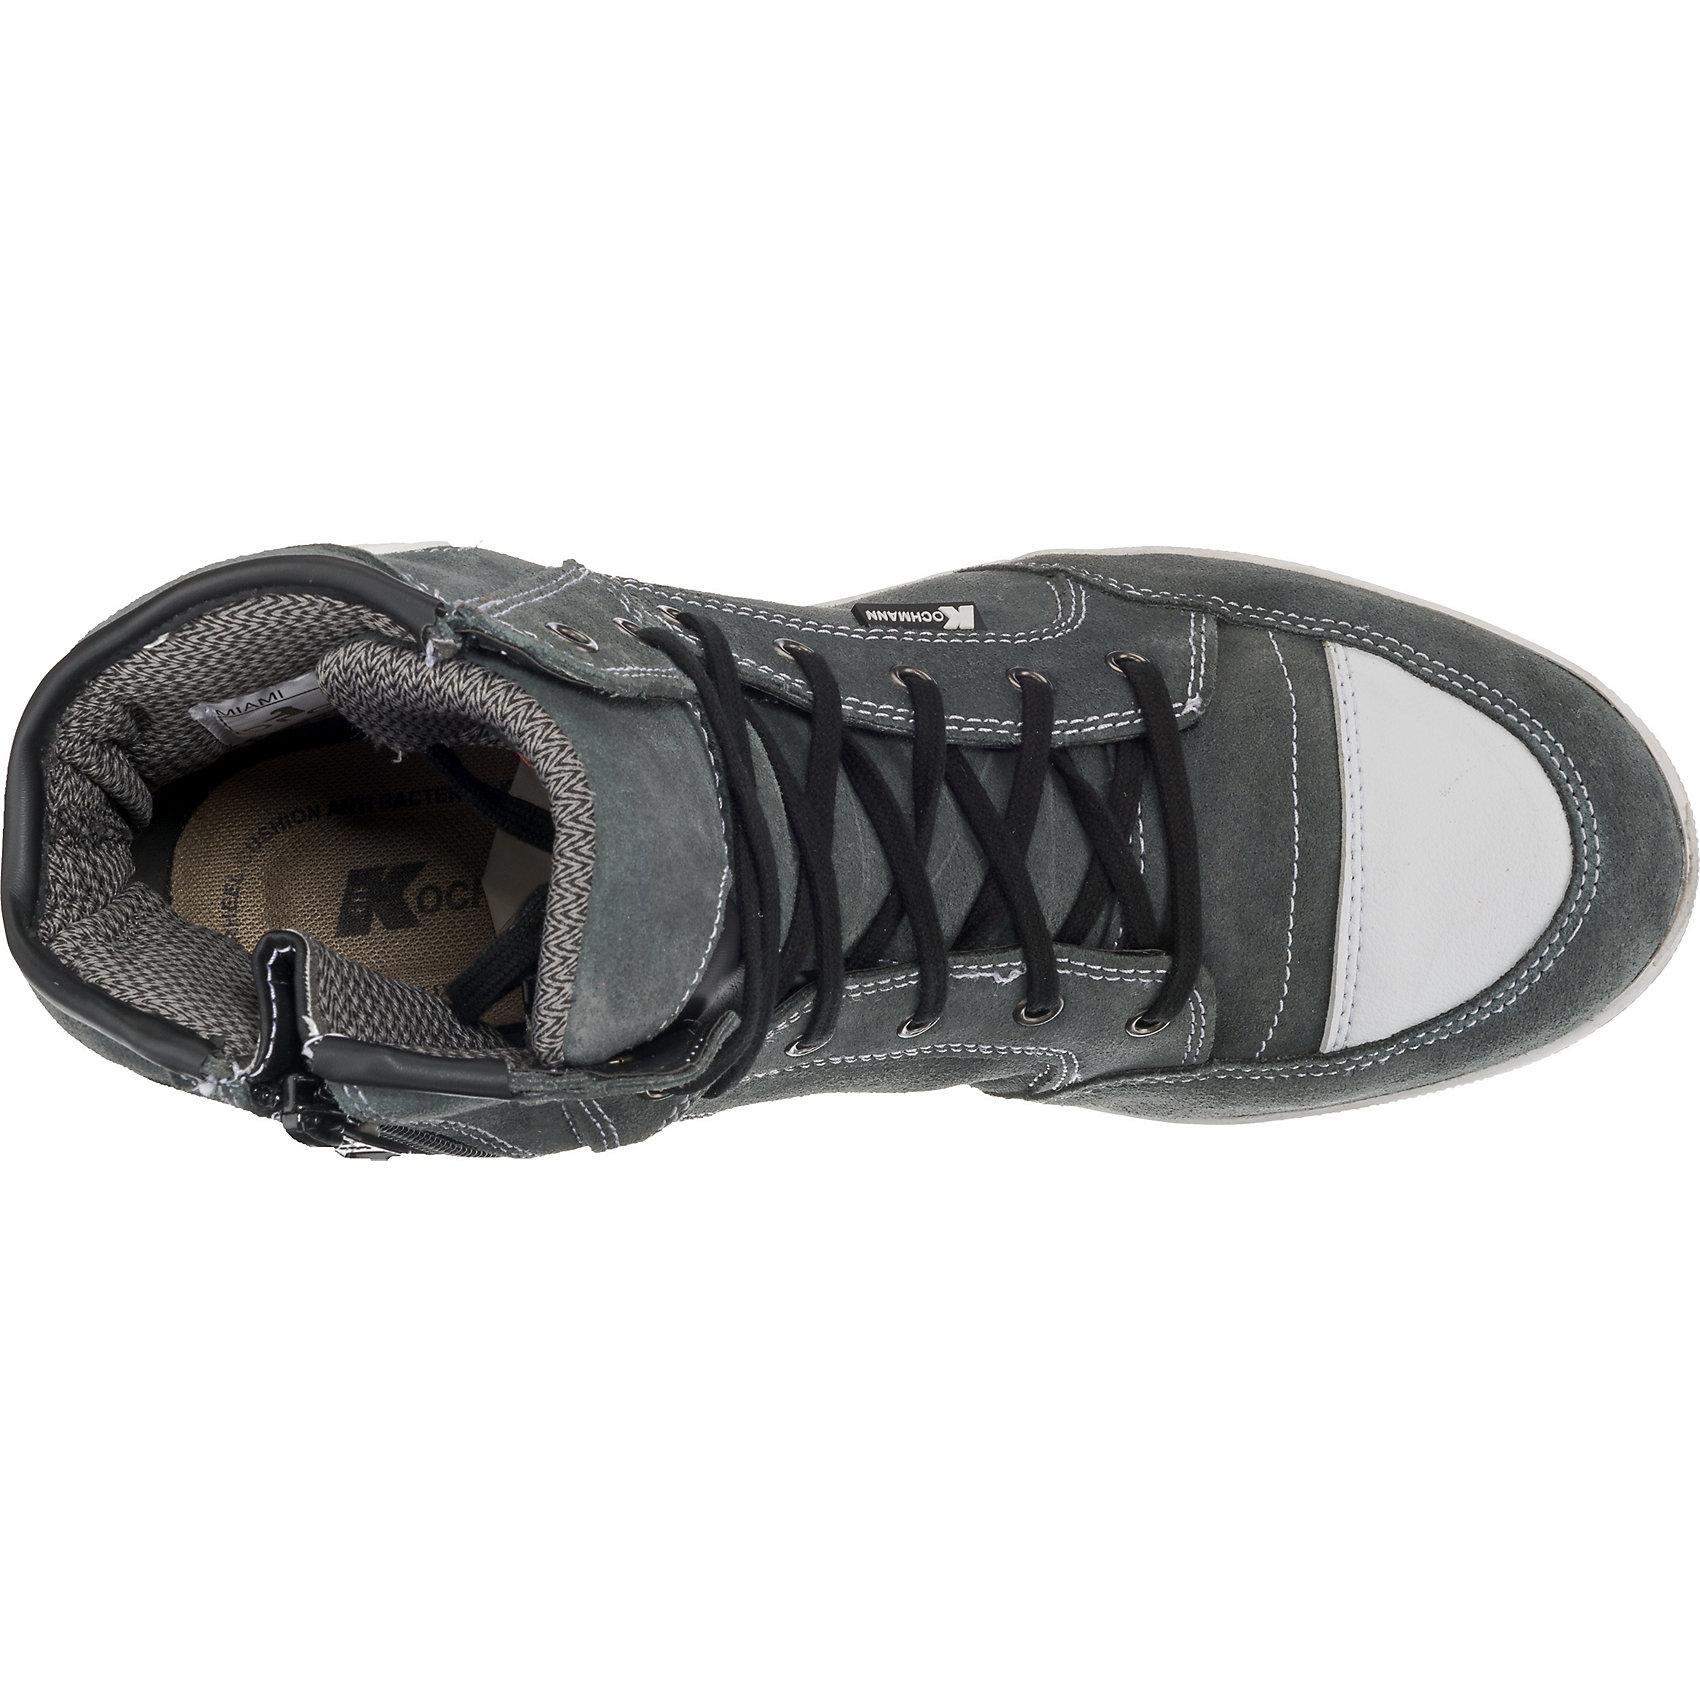 best sneakers 41757 e2864 ... NIKE AIR MAX MOTION LW 833260 Black Black Black Men 0050109 Free Track  Ship 226447 ...